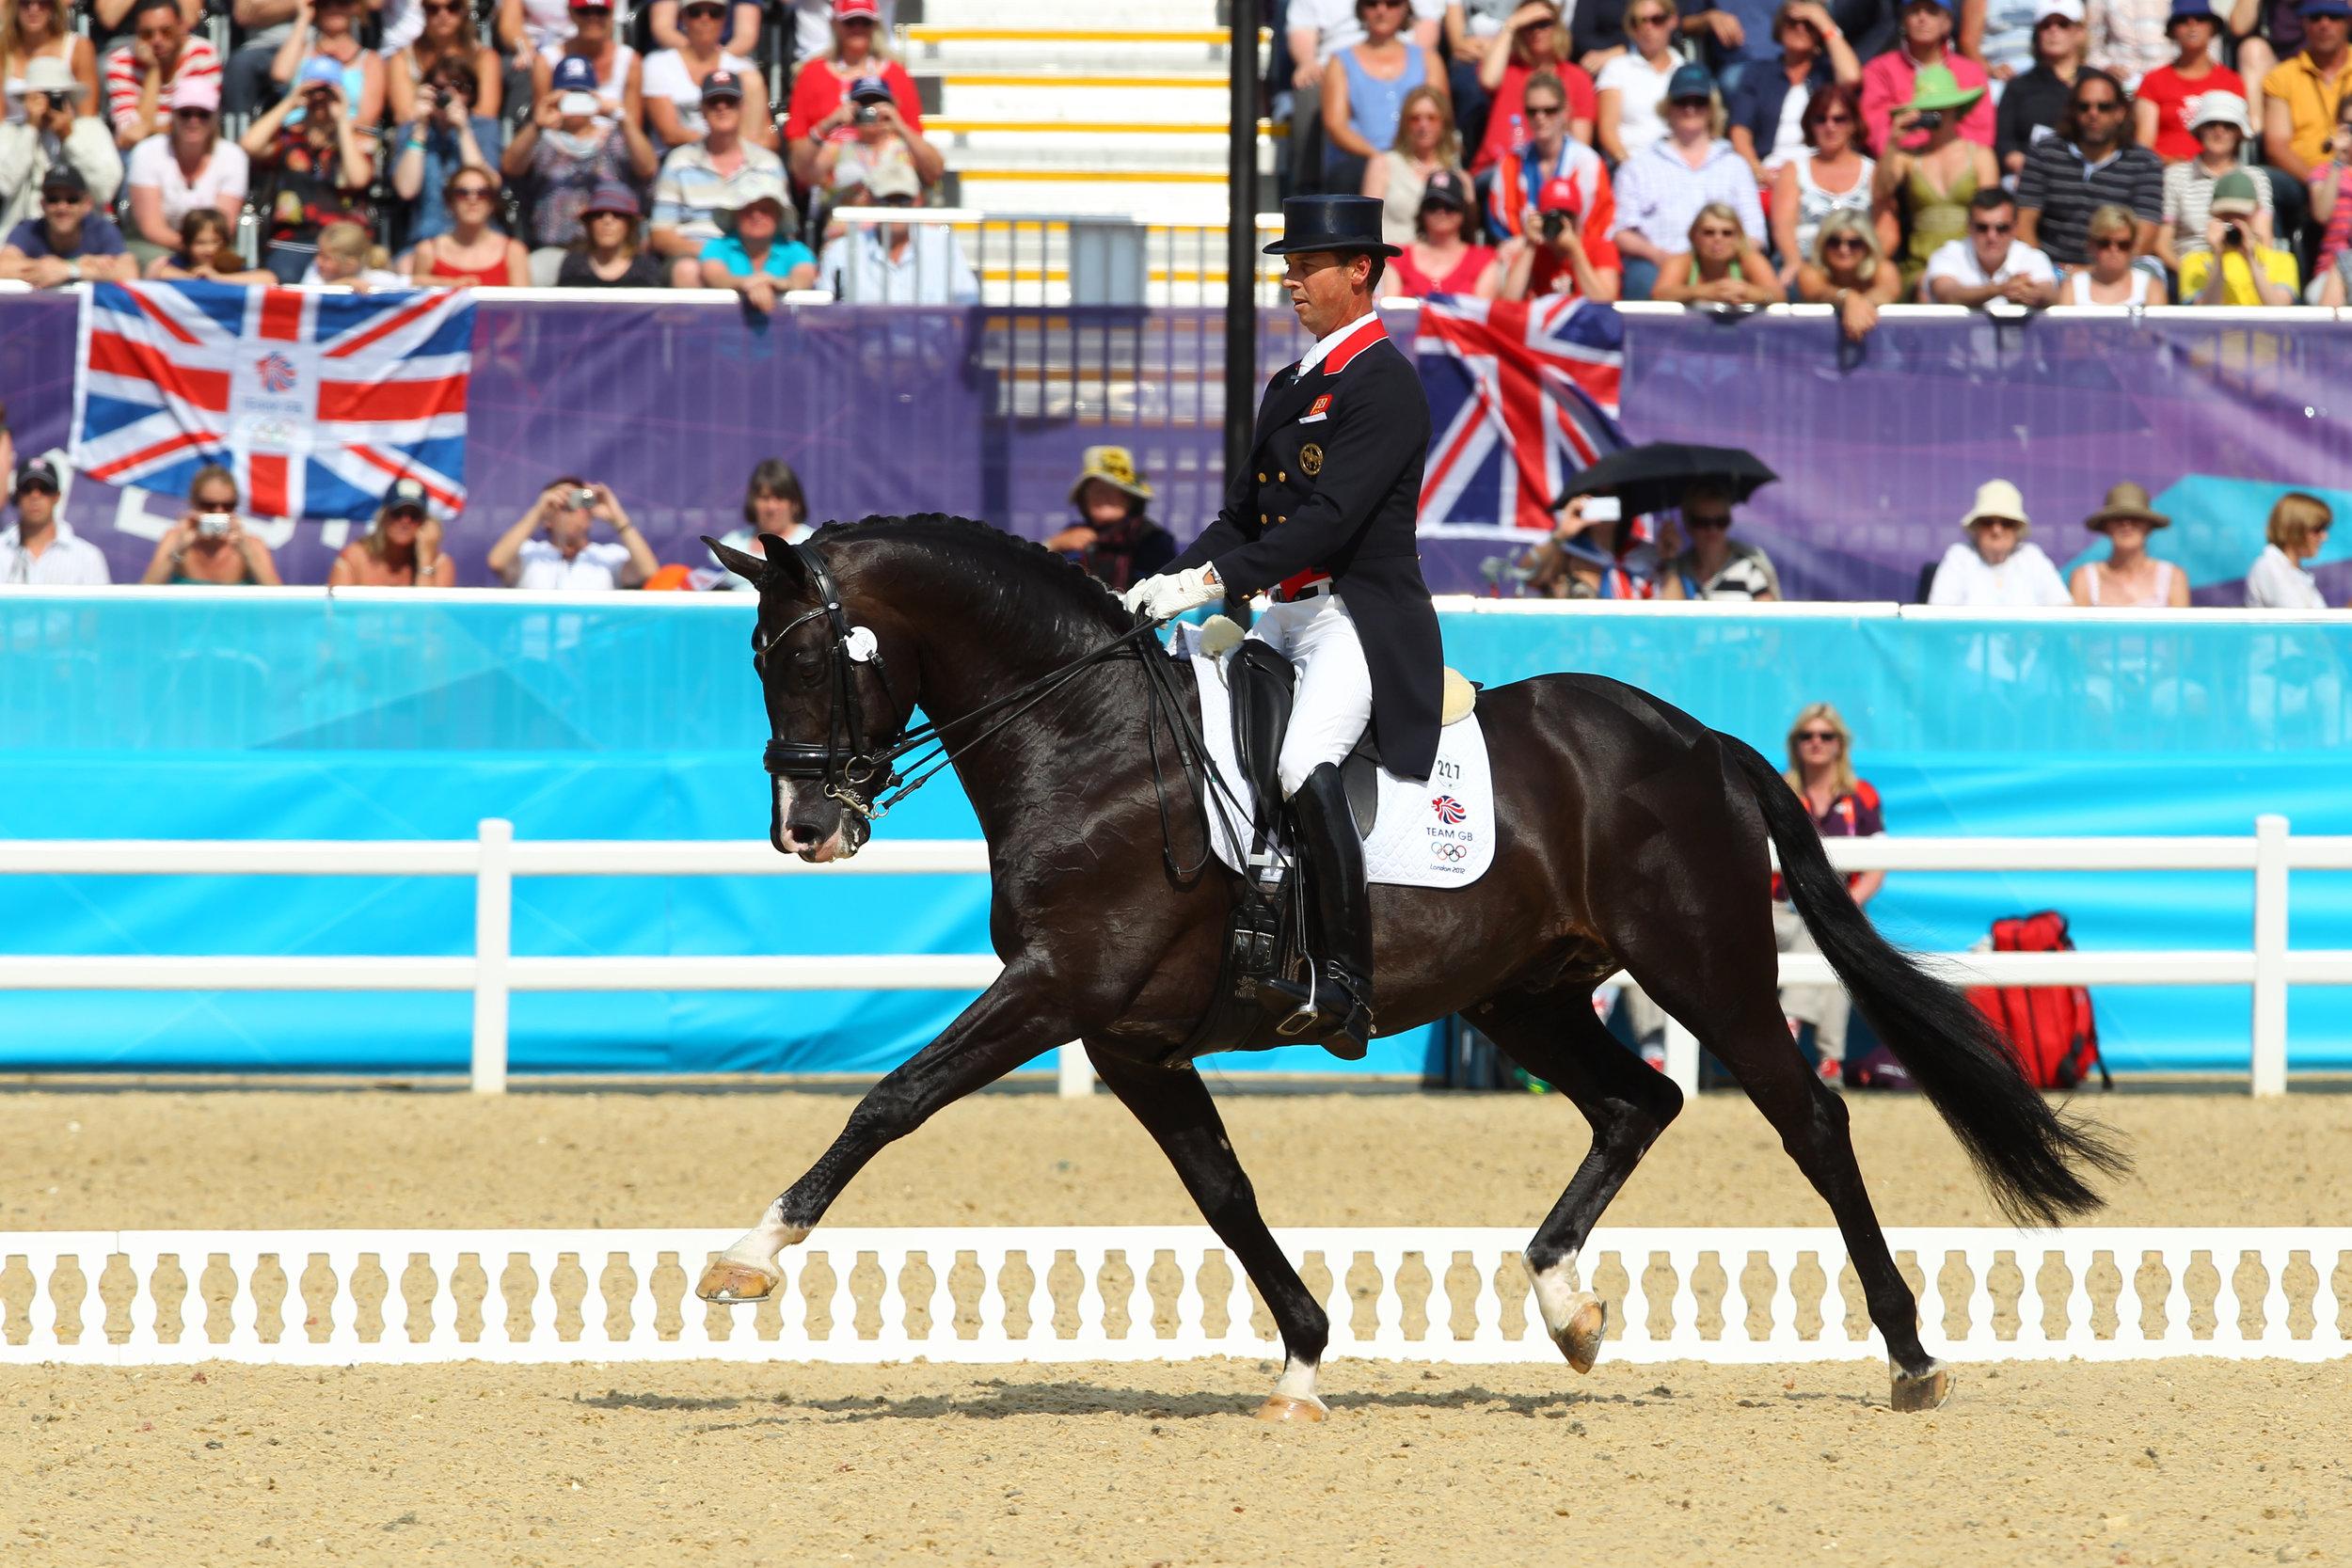 Carl Hester-Uthopia - Kur Dressage, London Olympics 2012.jpg